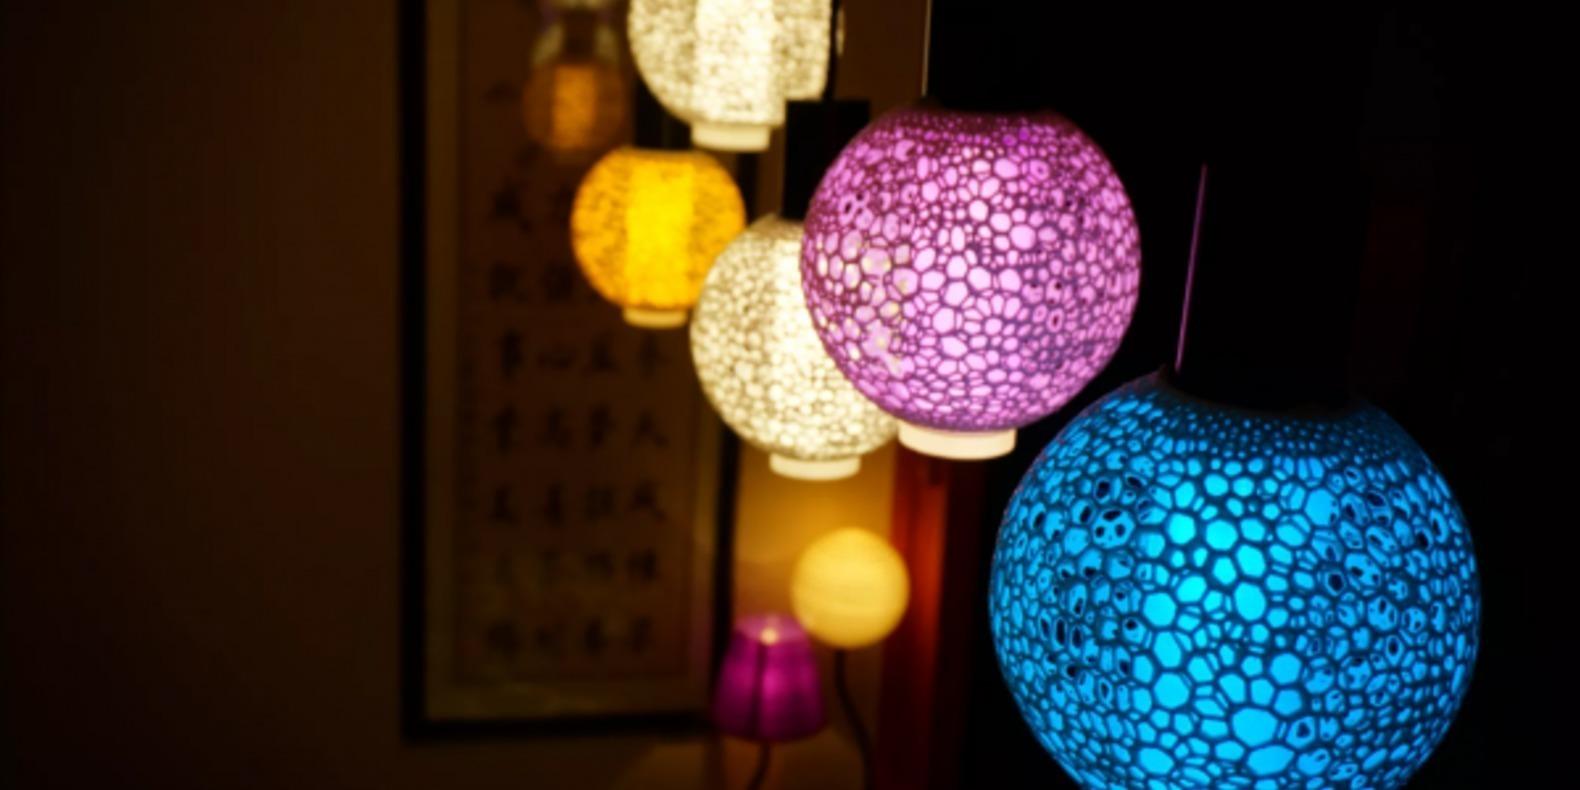 lampe sino makemakemake impression 3D fichier 3D cults 3